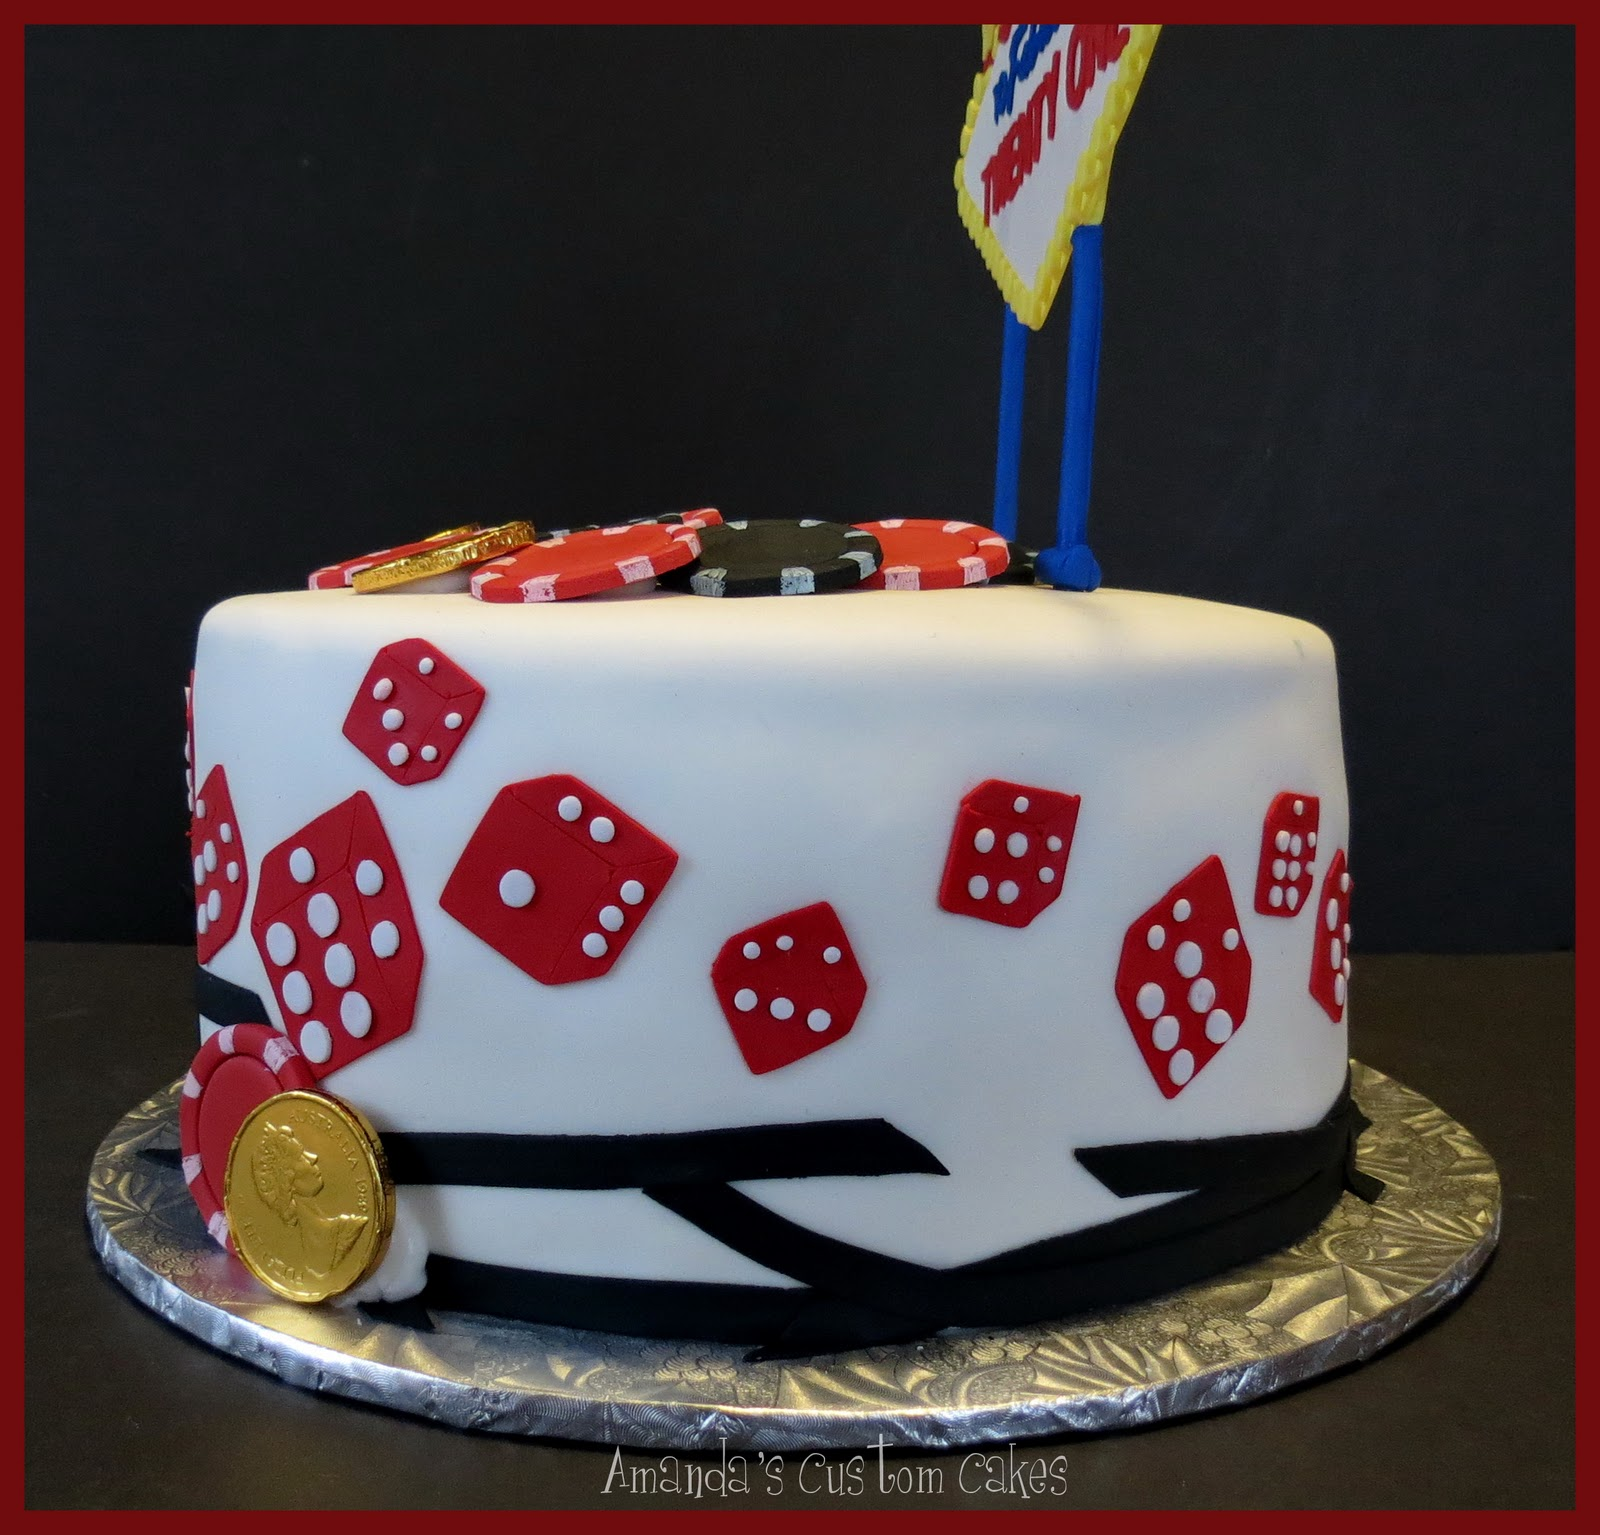 Amanda's Custom Cakes: Las Vegas Cake